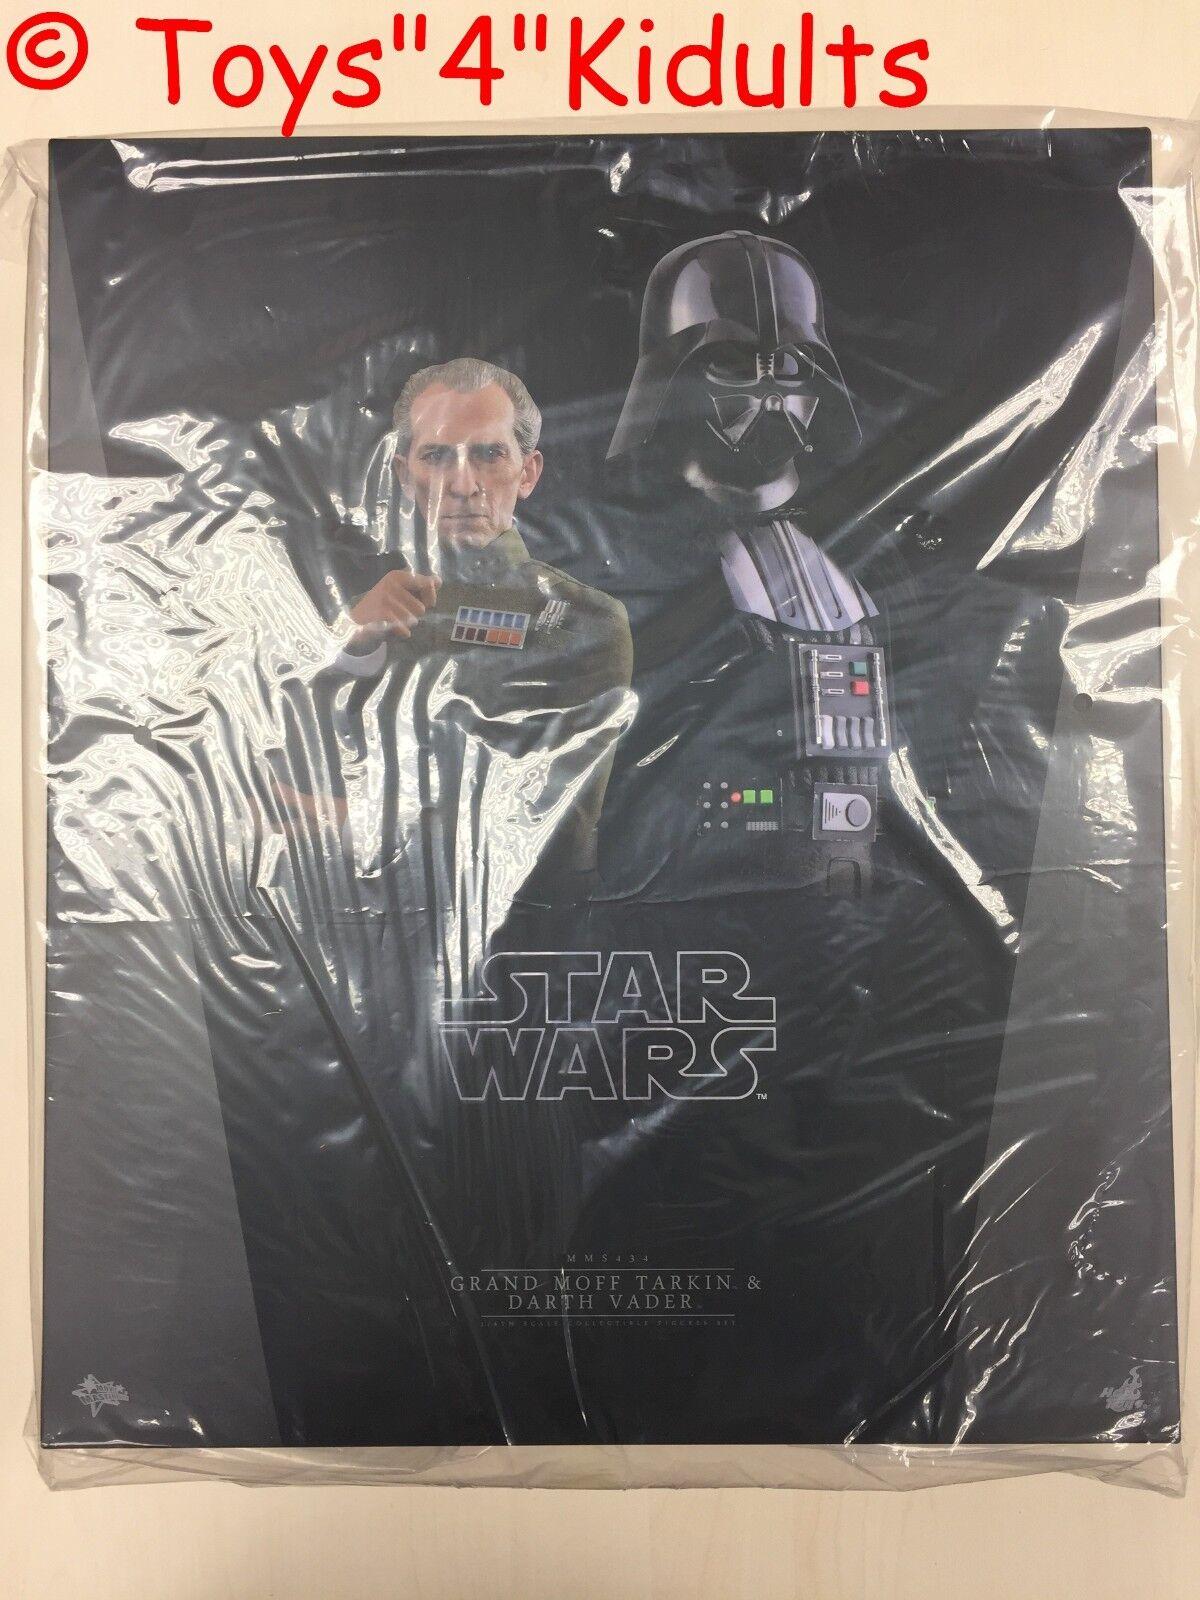 Hot Toys MMS 434 Star Wars Nueva Esperanza Grand Moff Tarkin & Darth Vader set nuevo